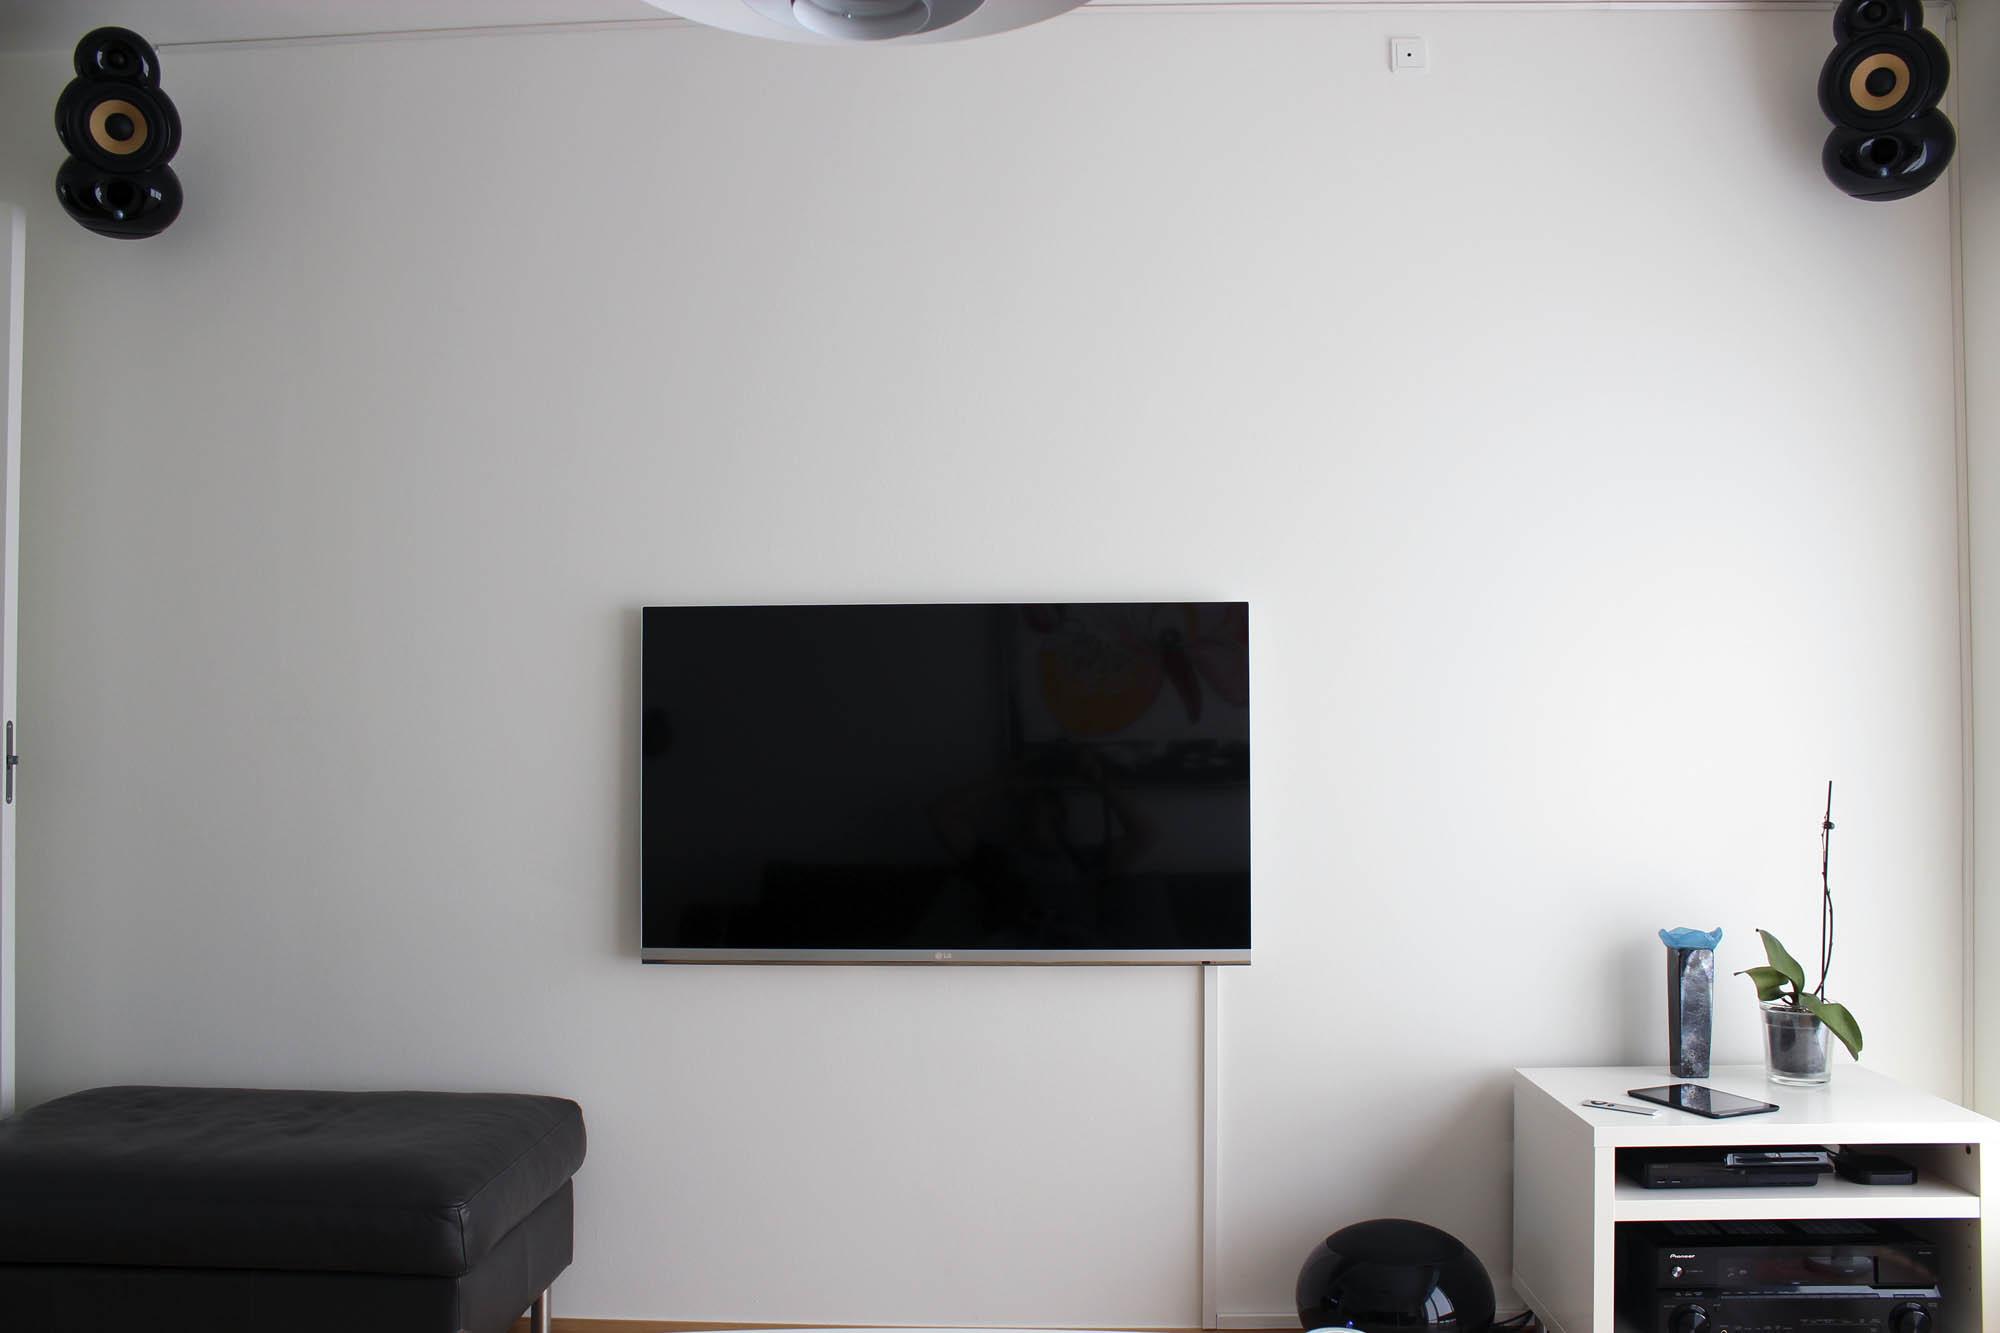 Nicolais stue-setup (lejlighed) - recordere.dk forum